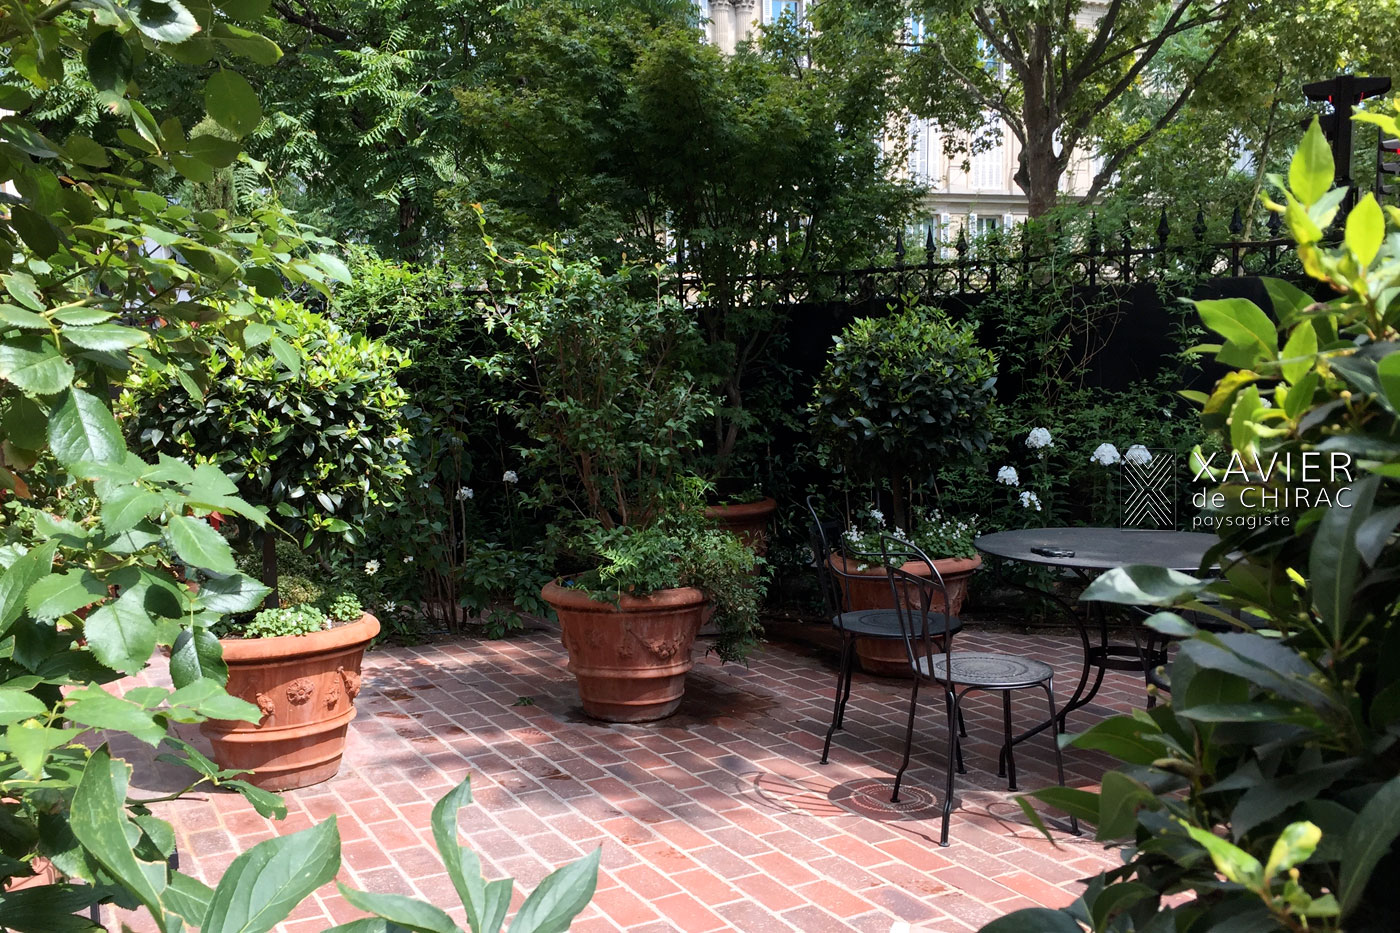 jardins archives xavier de chirac